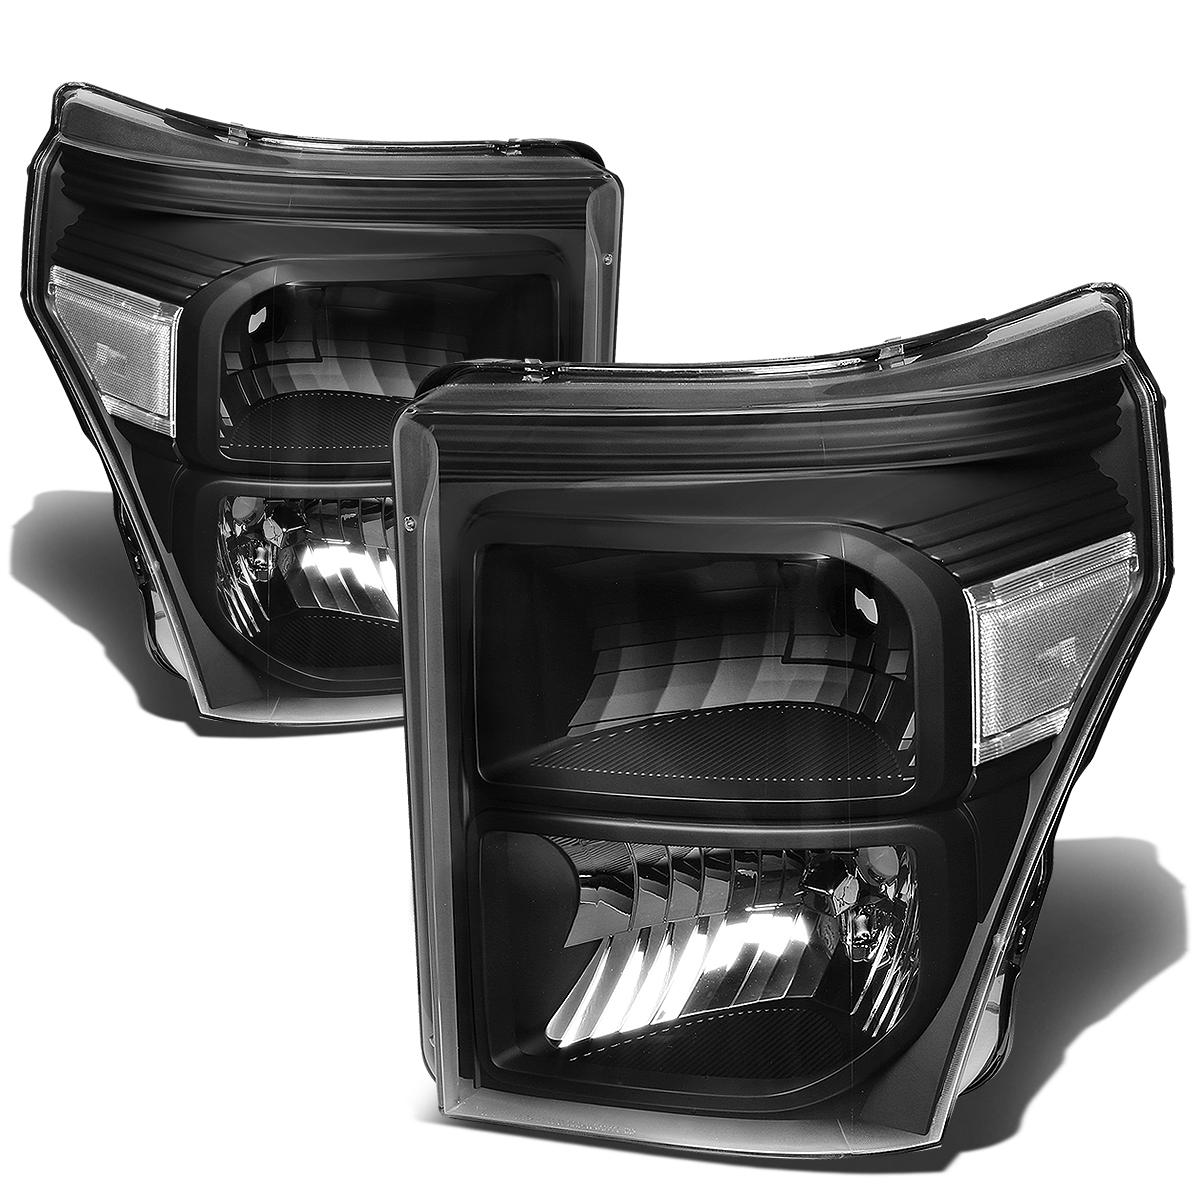 For 2011 To 2016 Ford F250 F350 F450 F550 Super Duty Headlight Black Housing Clear Corner